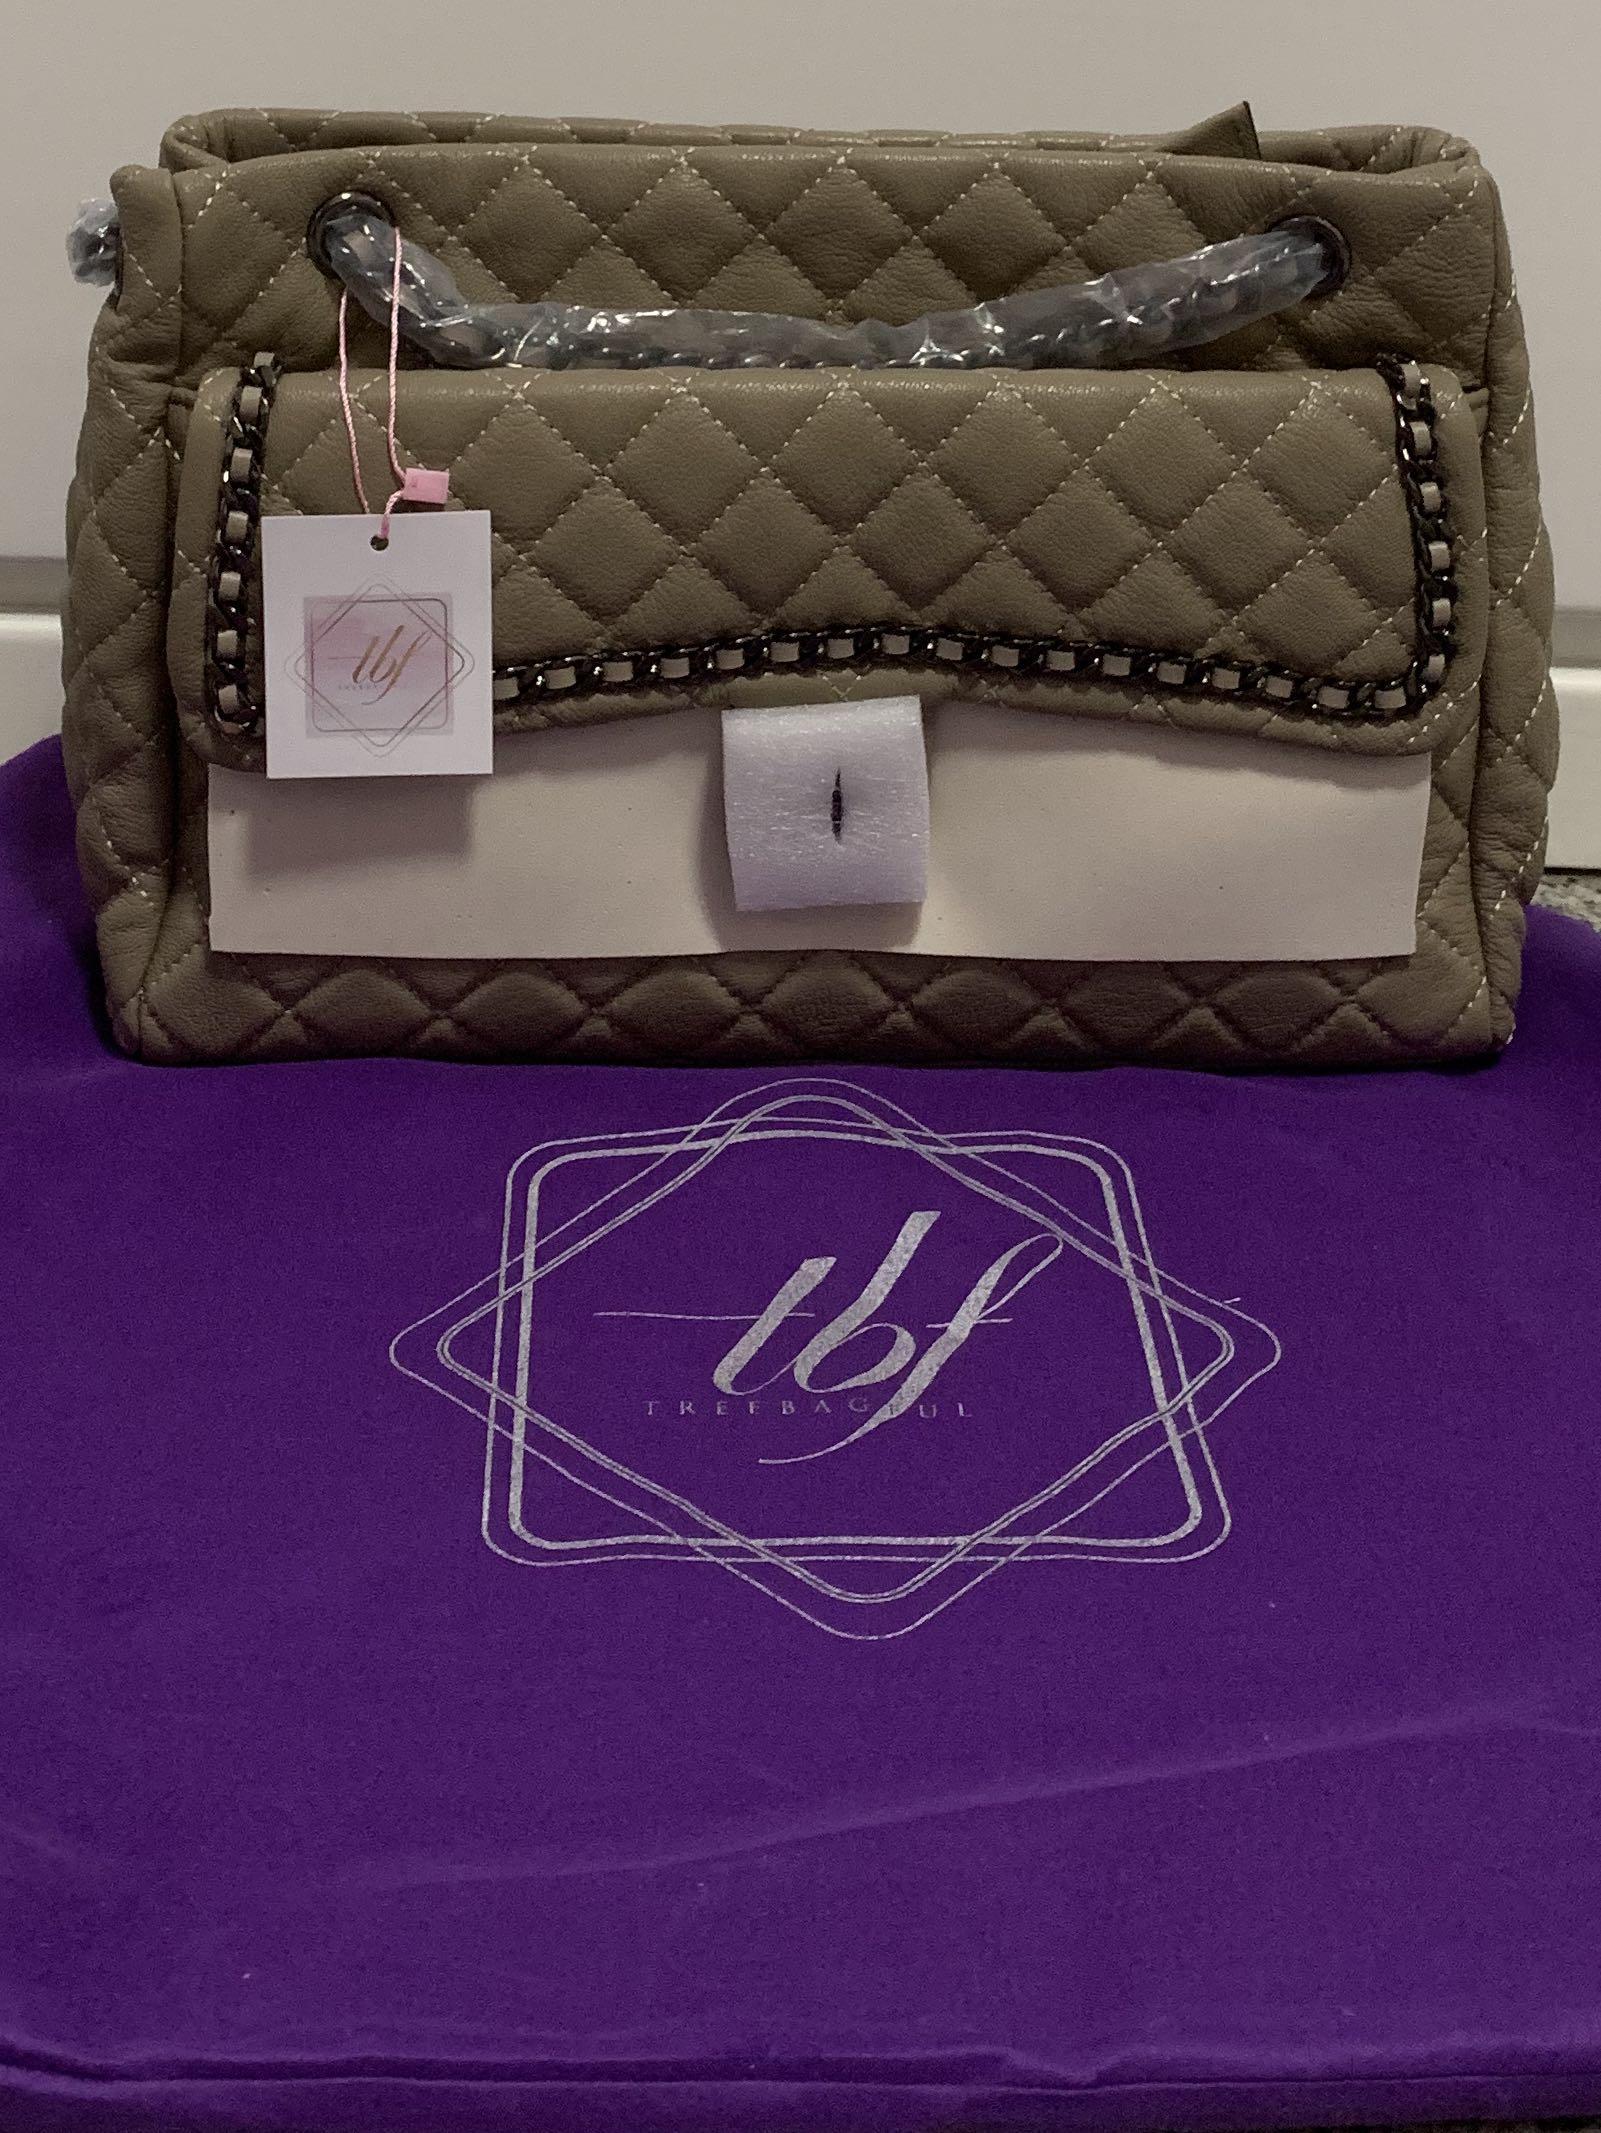 Treebagful genuine leather tote bag